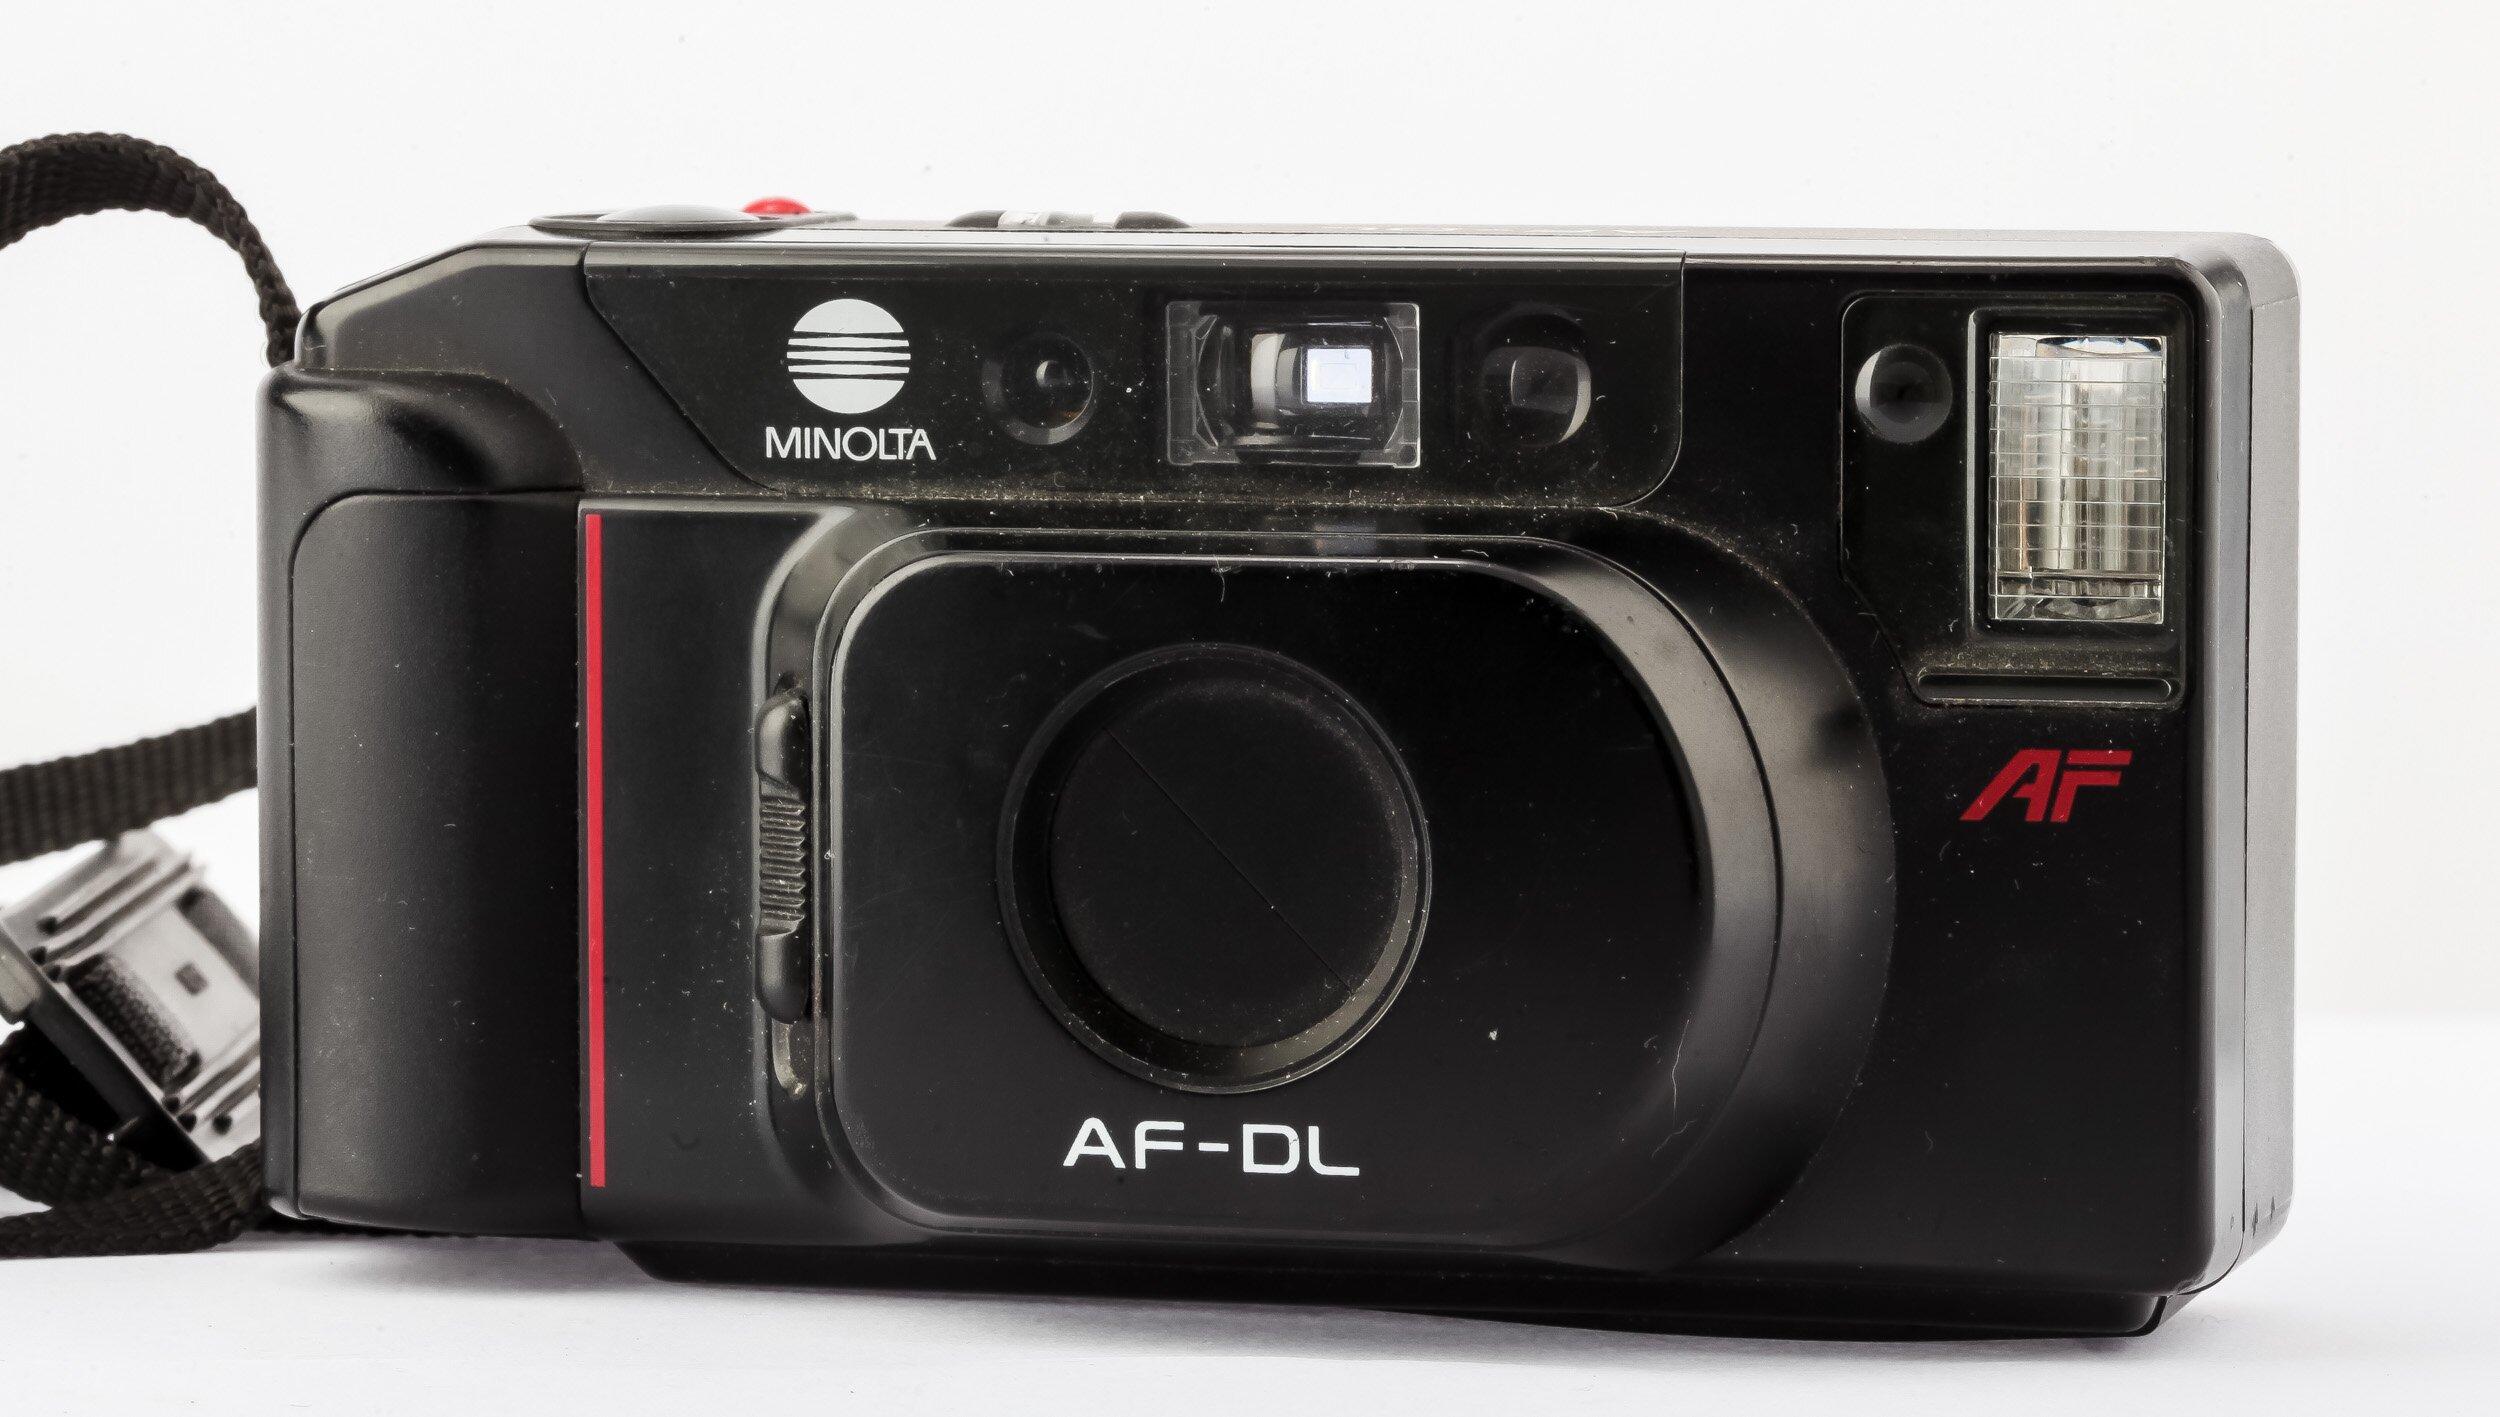 Minolta AF-DL Analoge Kompaktkamera